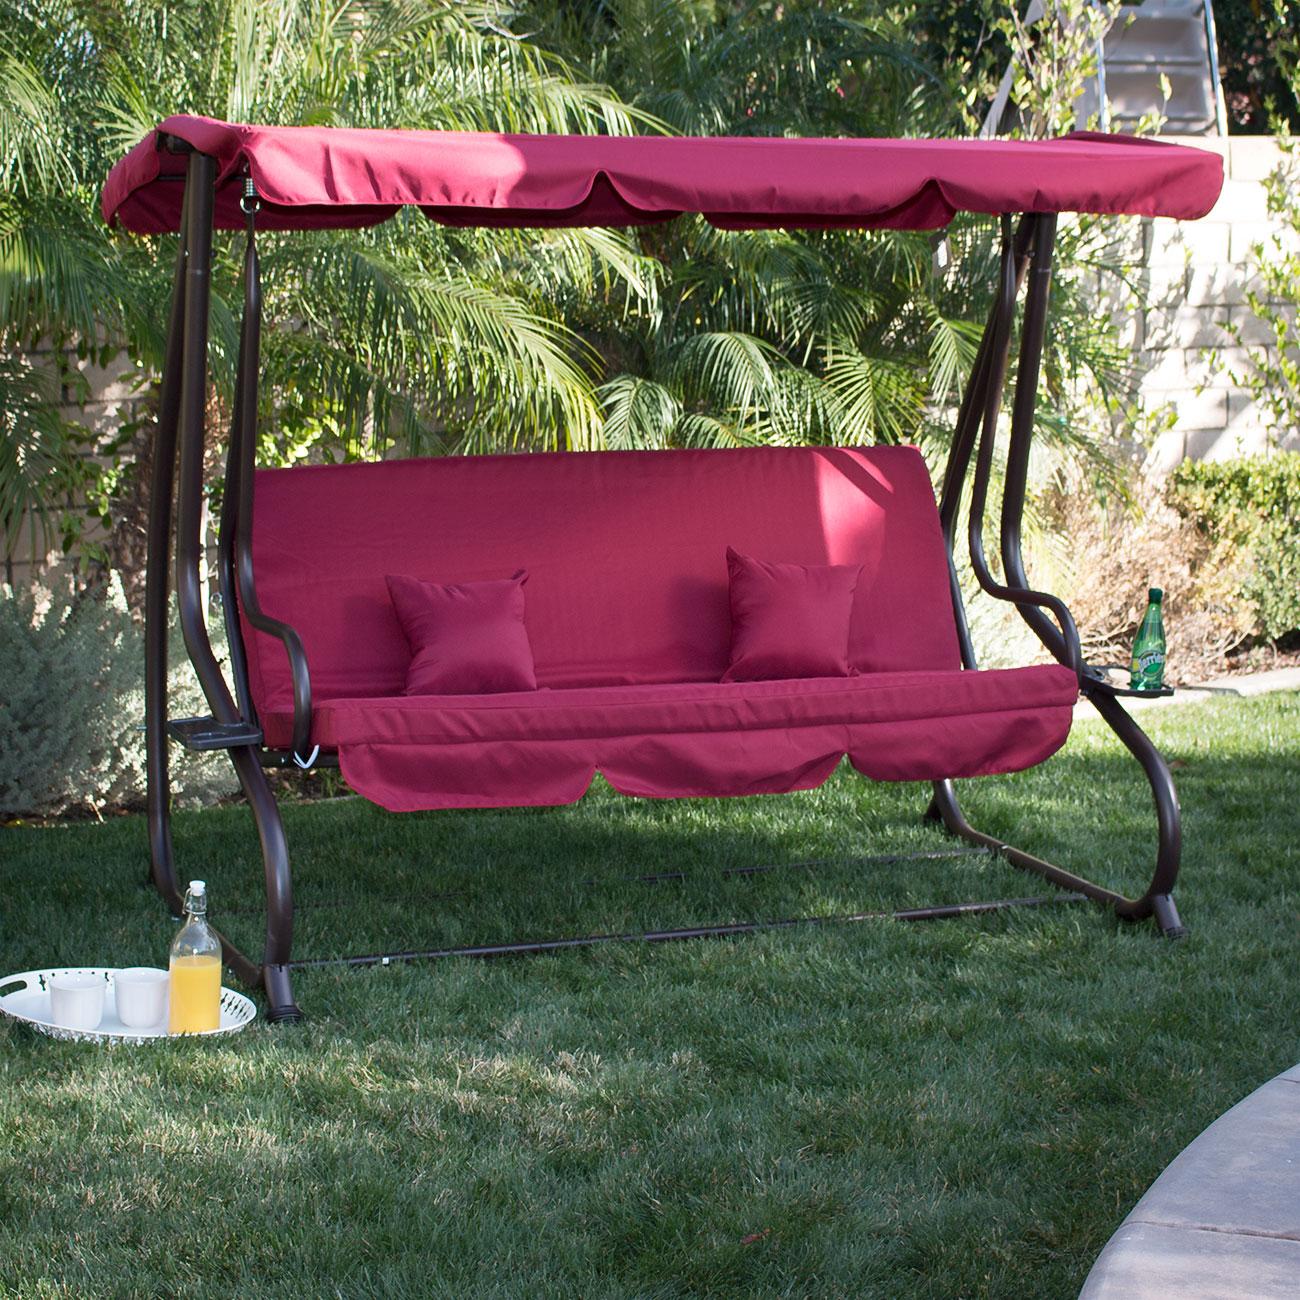 3 Person Outdoor Swing W Canopy Seat Patio Hammock